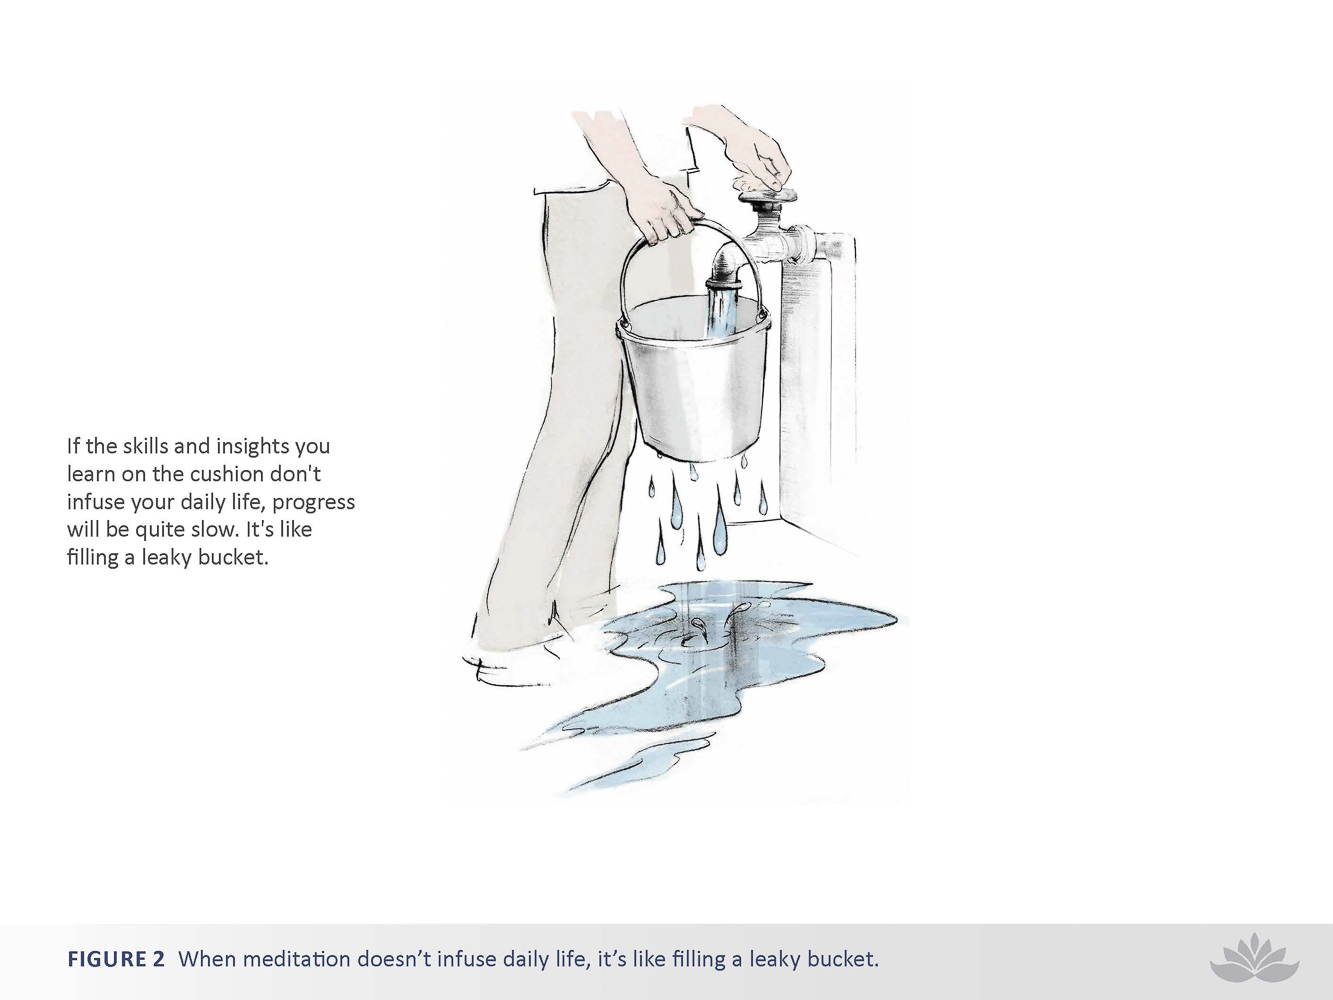 nwd-illustration-05-5.jpg